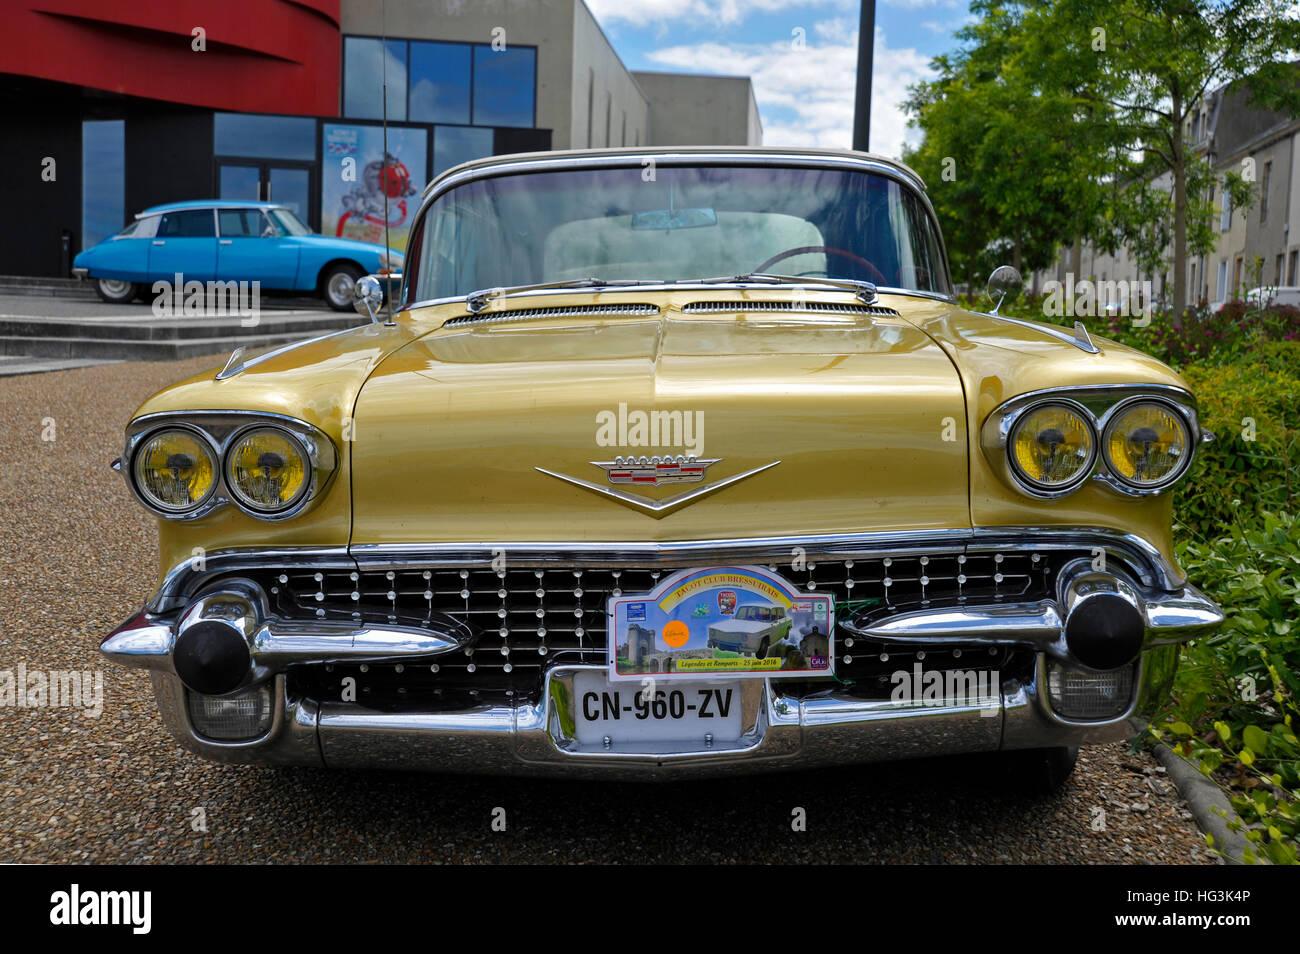 vehicles eldorado convertible premier hd auction cadillac